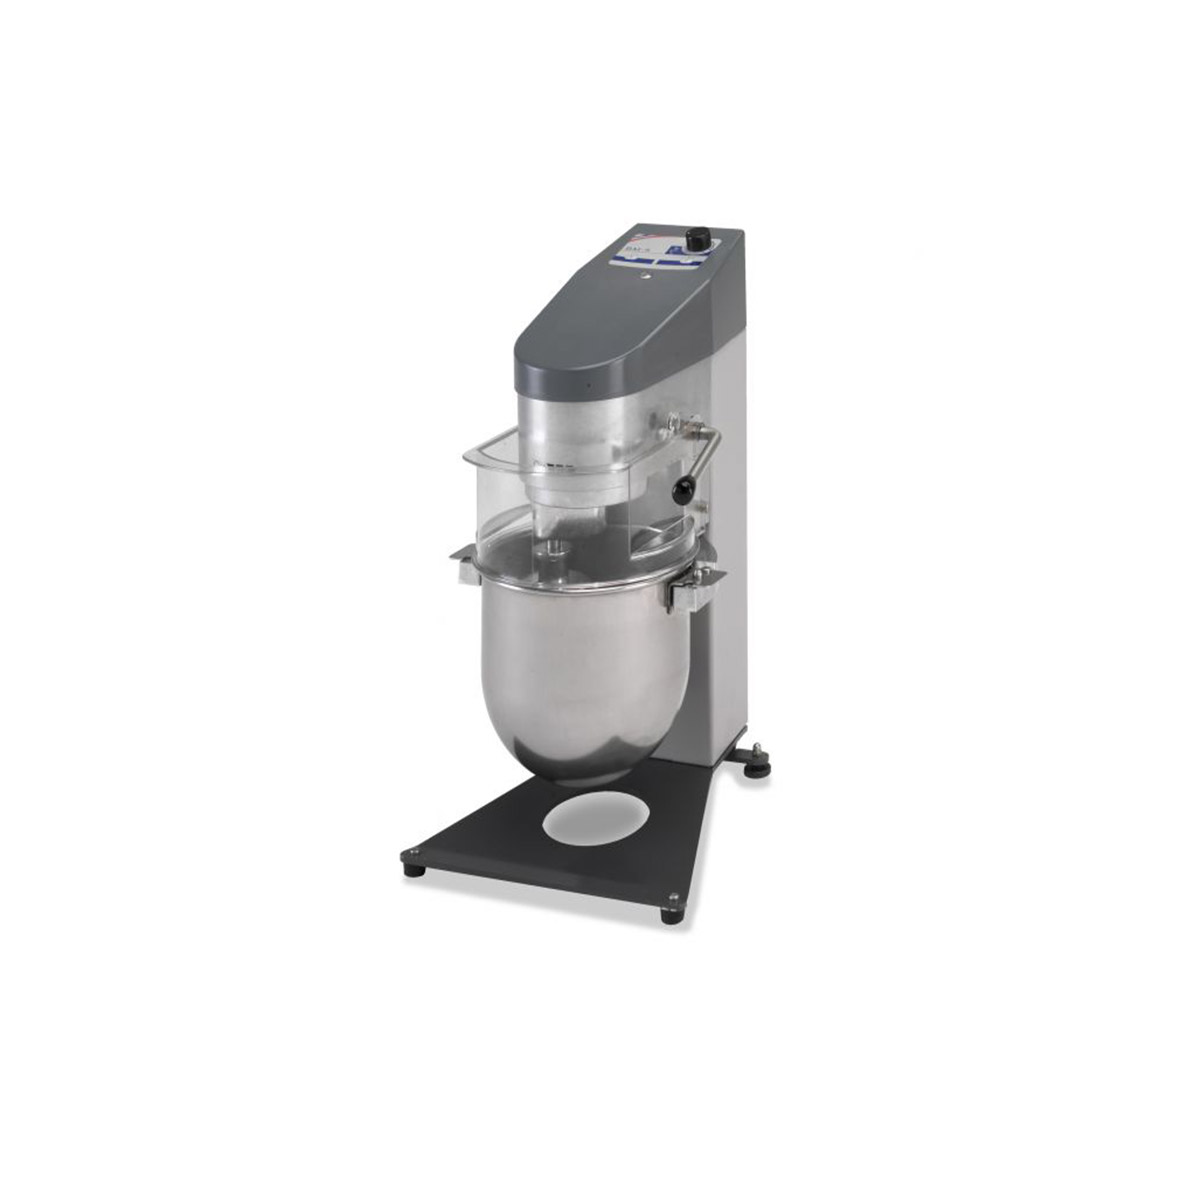 Sammic BM-5 Table Top Food Mixer